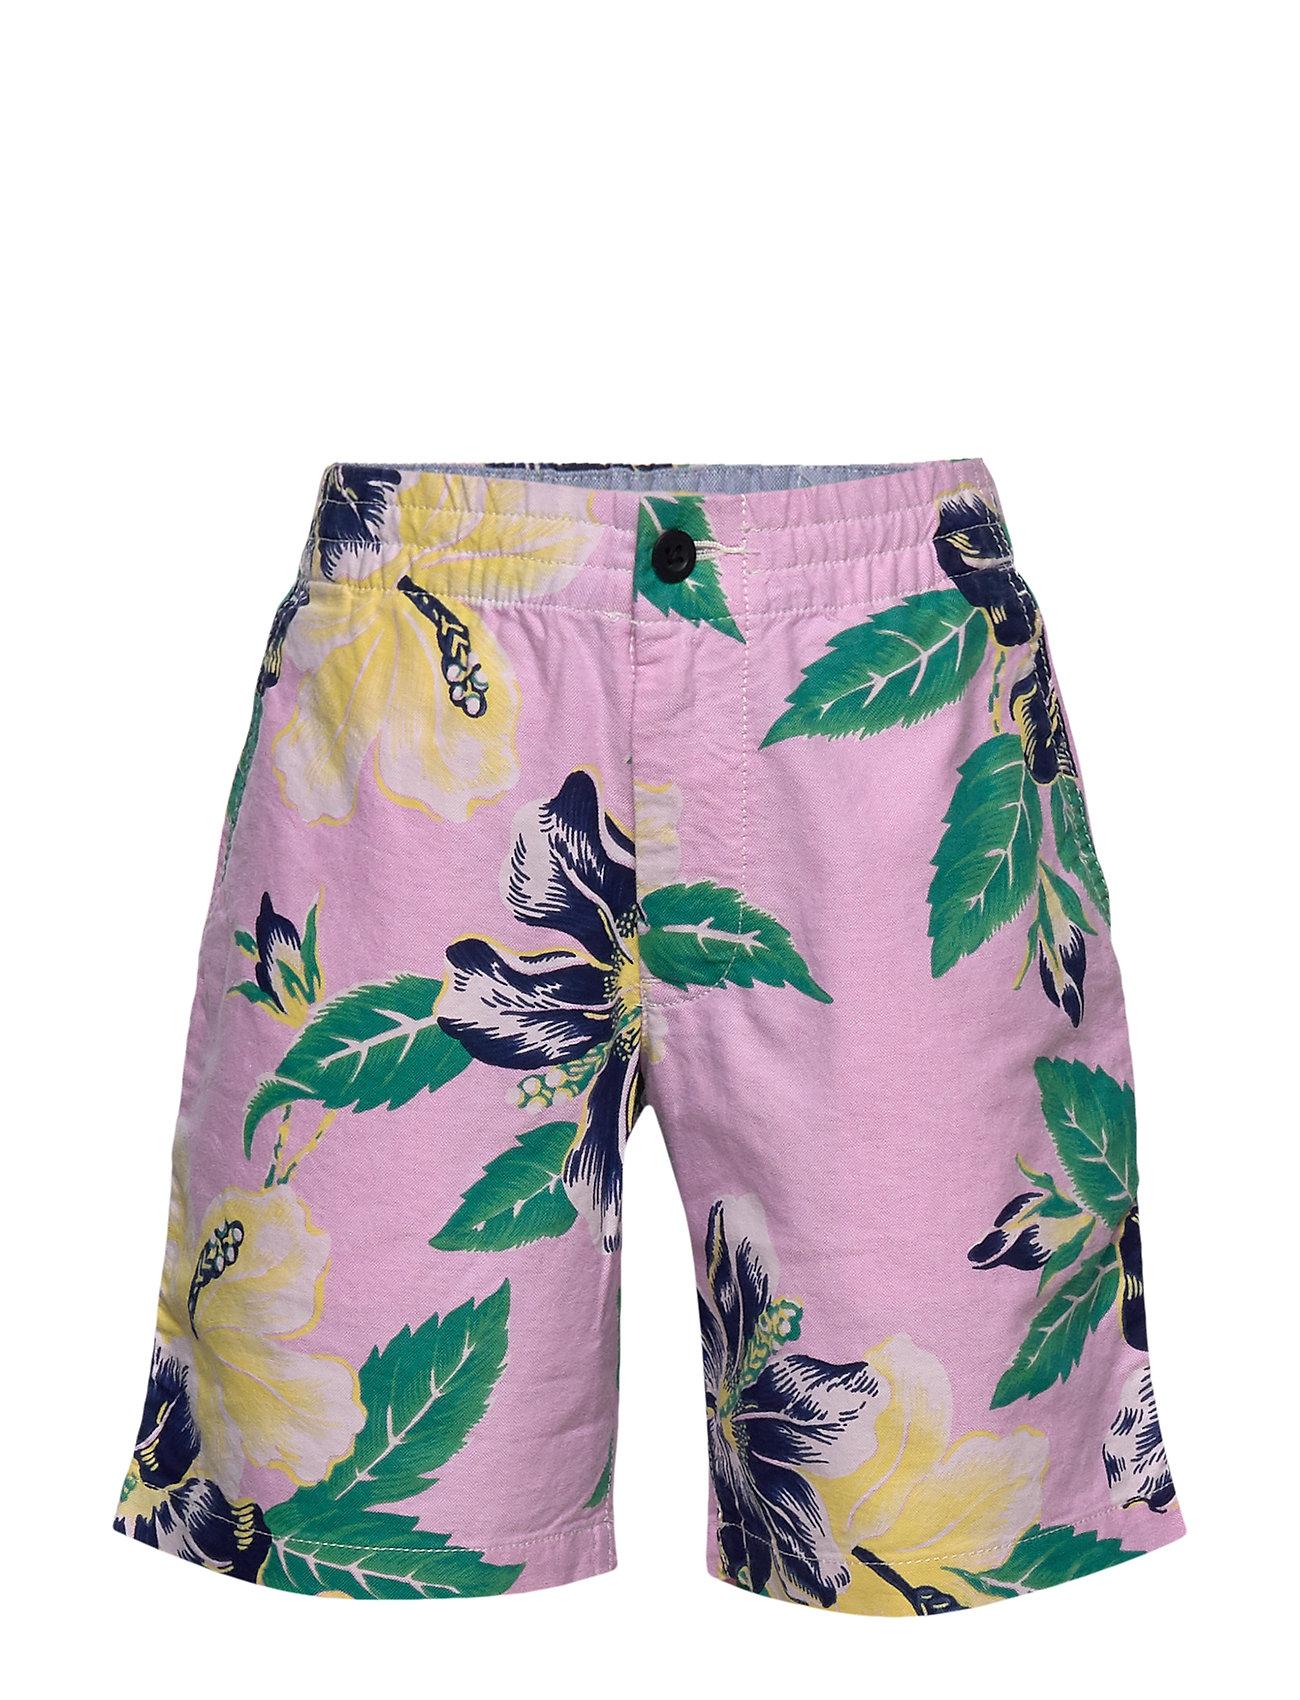 Ralph Lauren Kids Polo Prepster Oxford Short - VINTAGE HIBISCUS